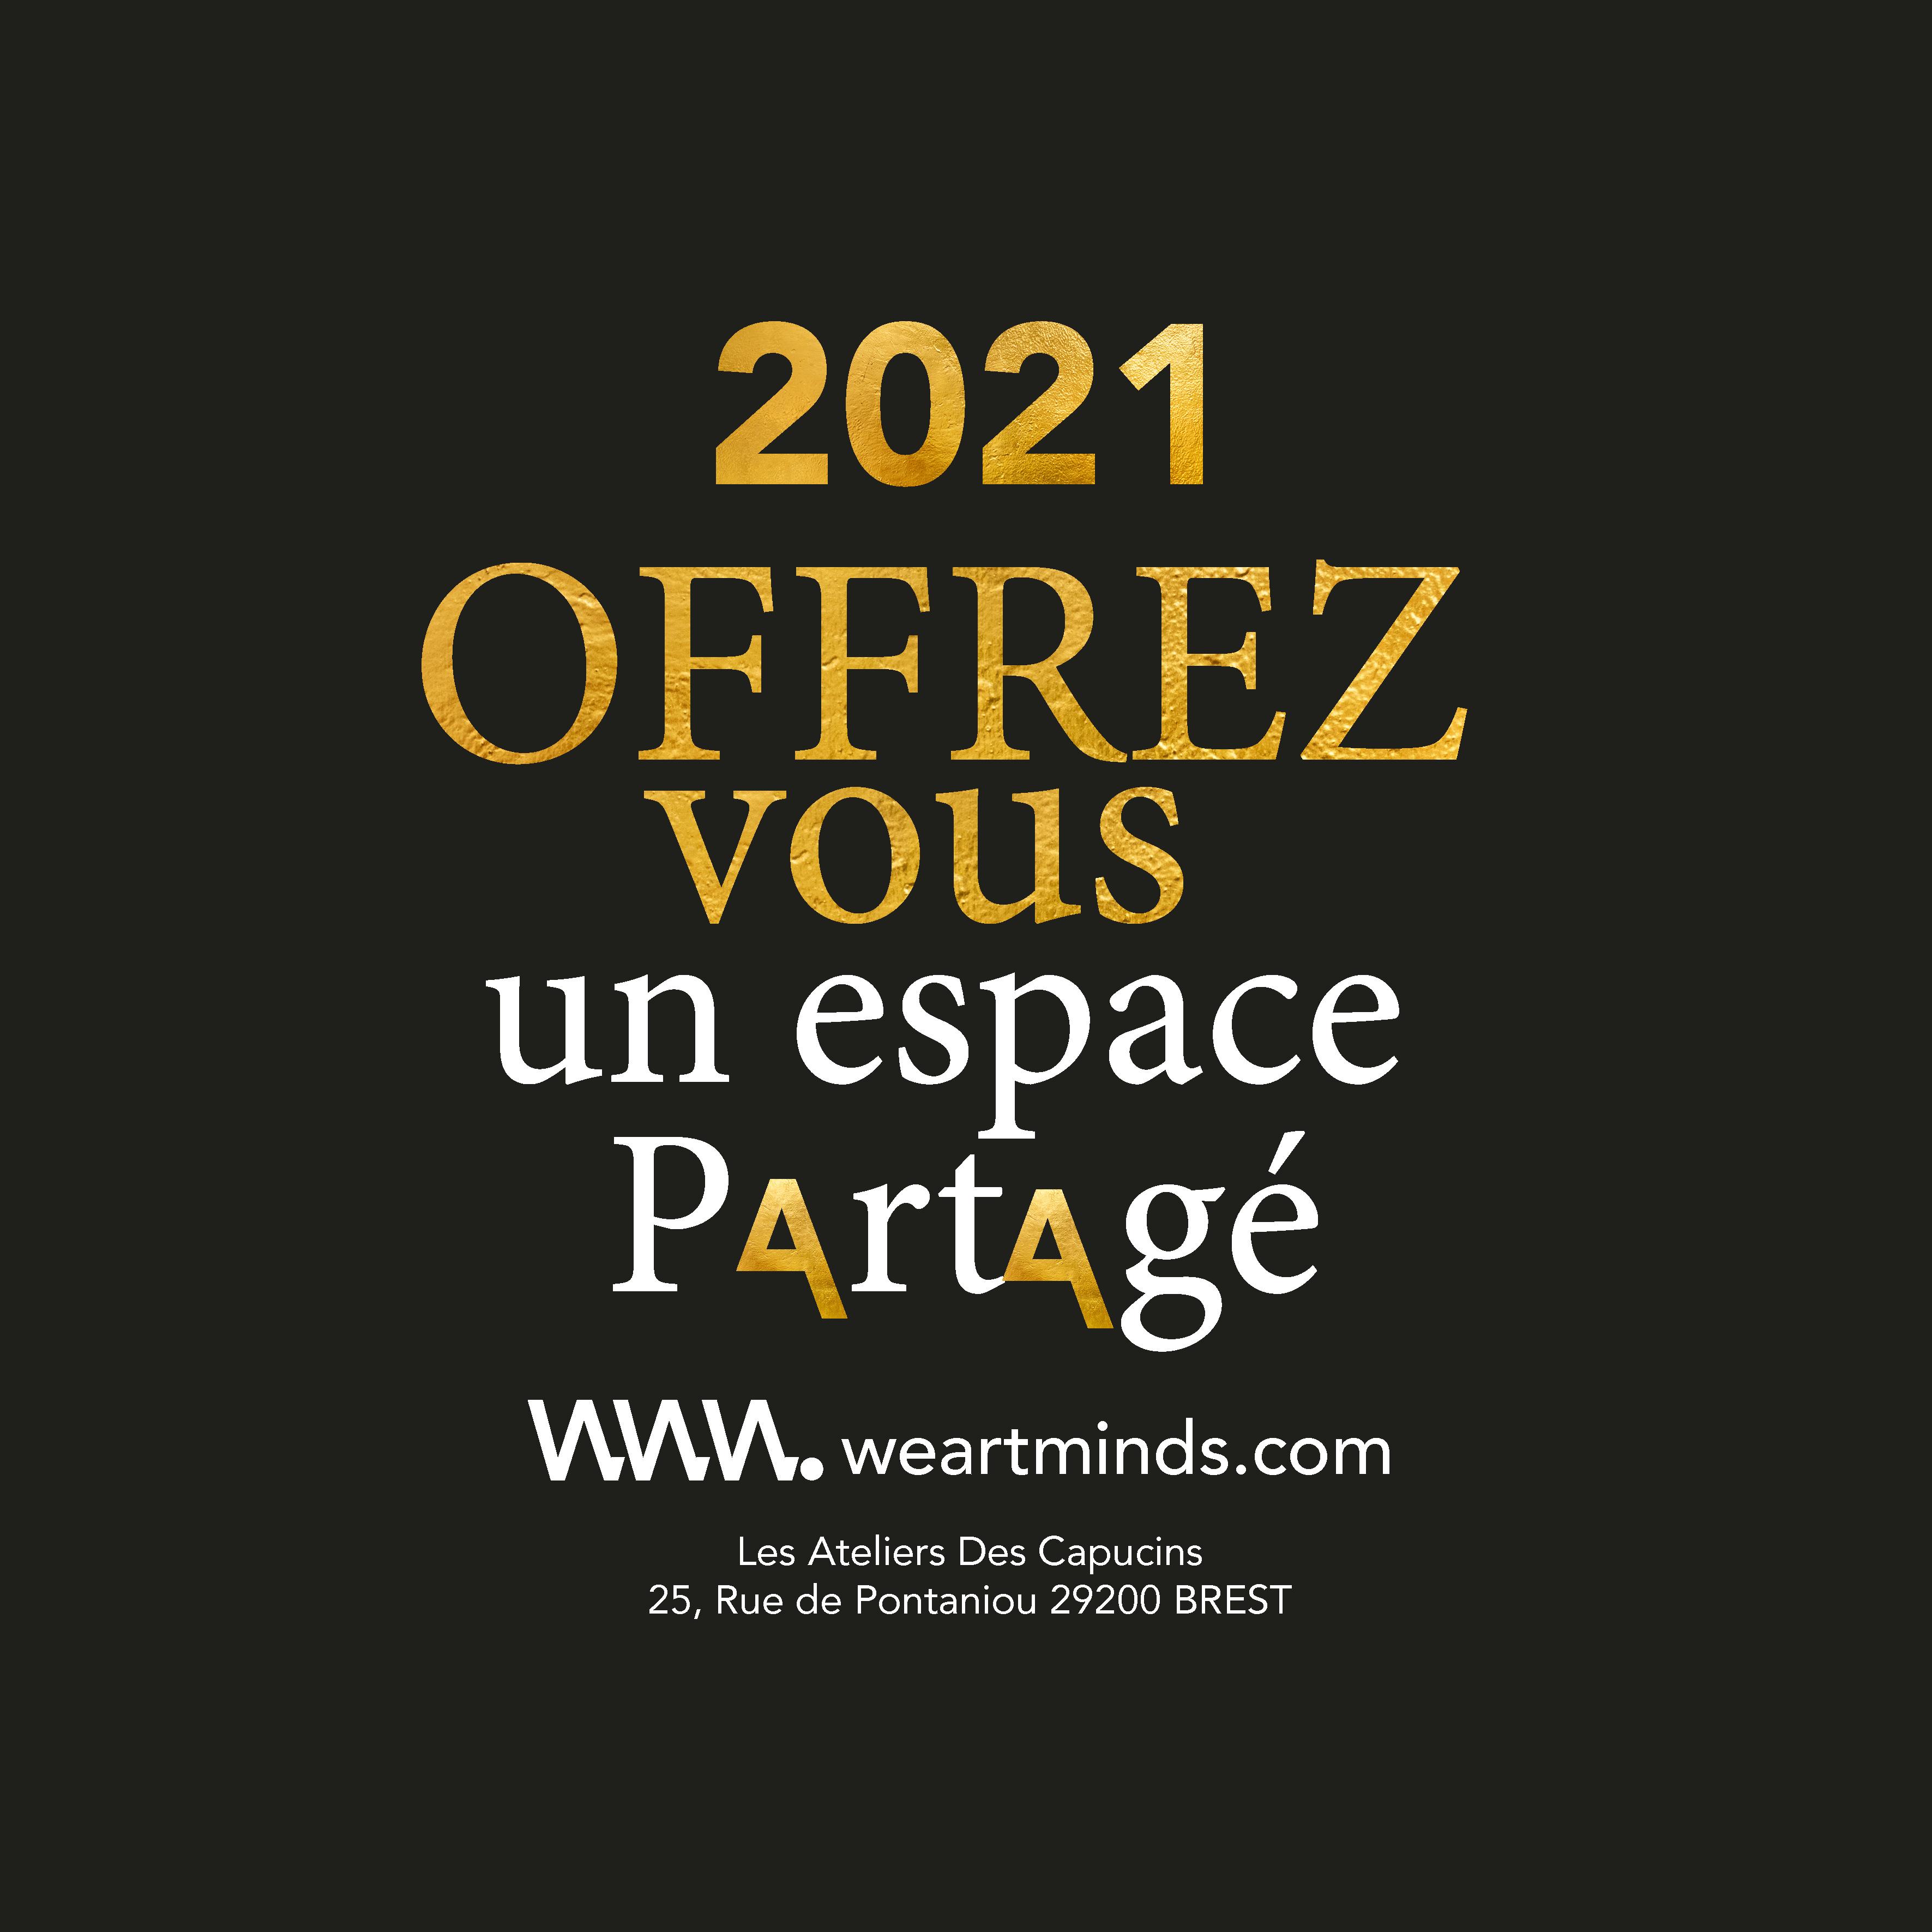 carte8 WAM 1220